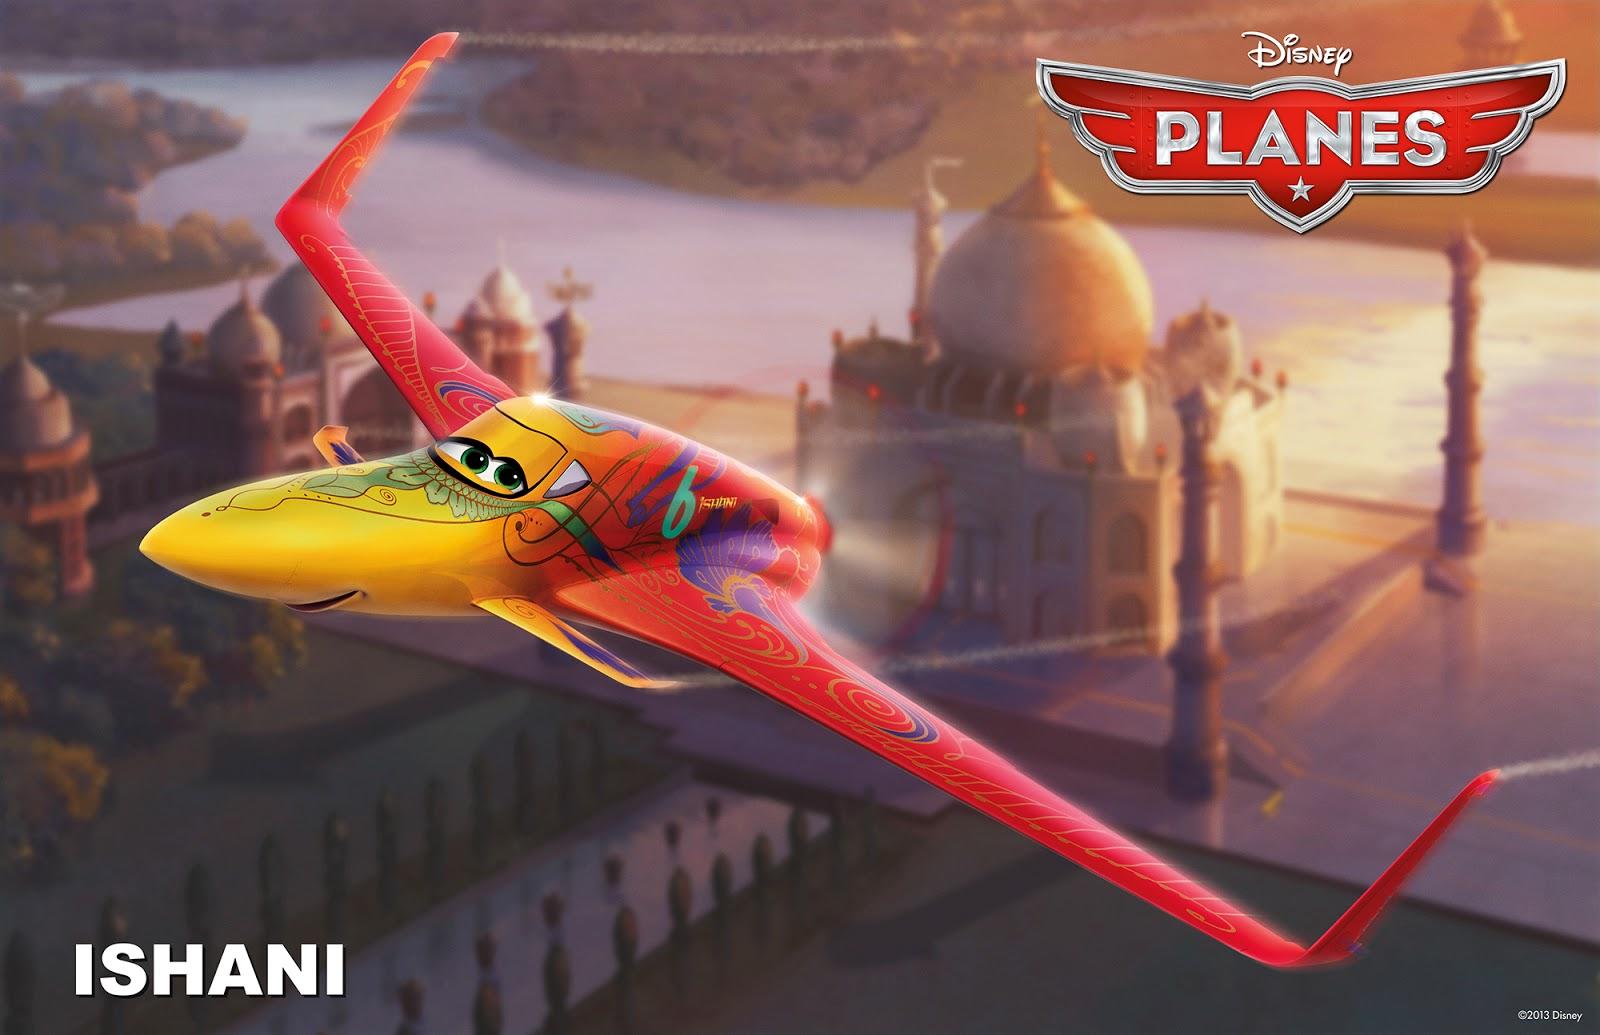 At Darren's World of Entertainment: Disney Planes ...